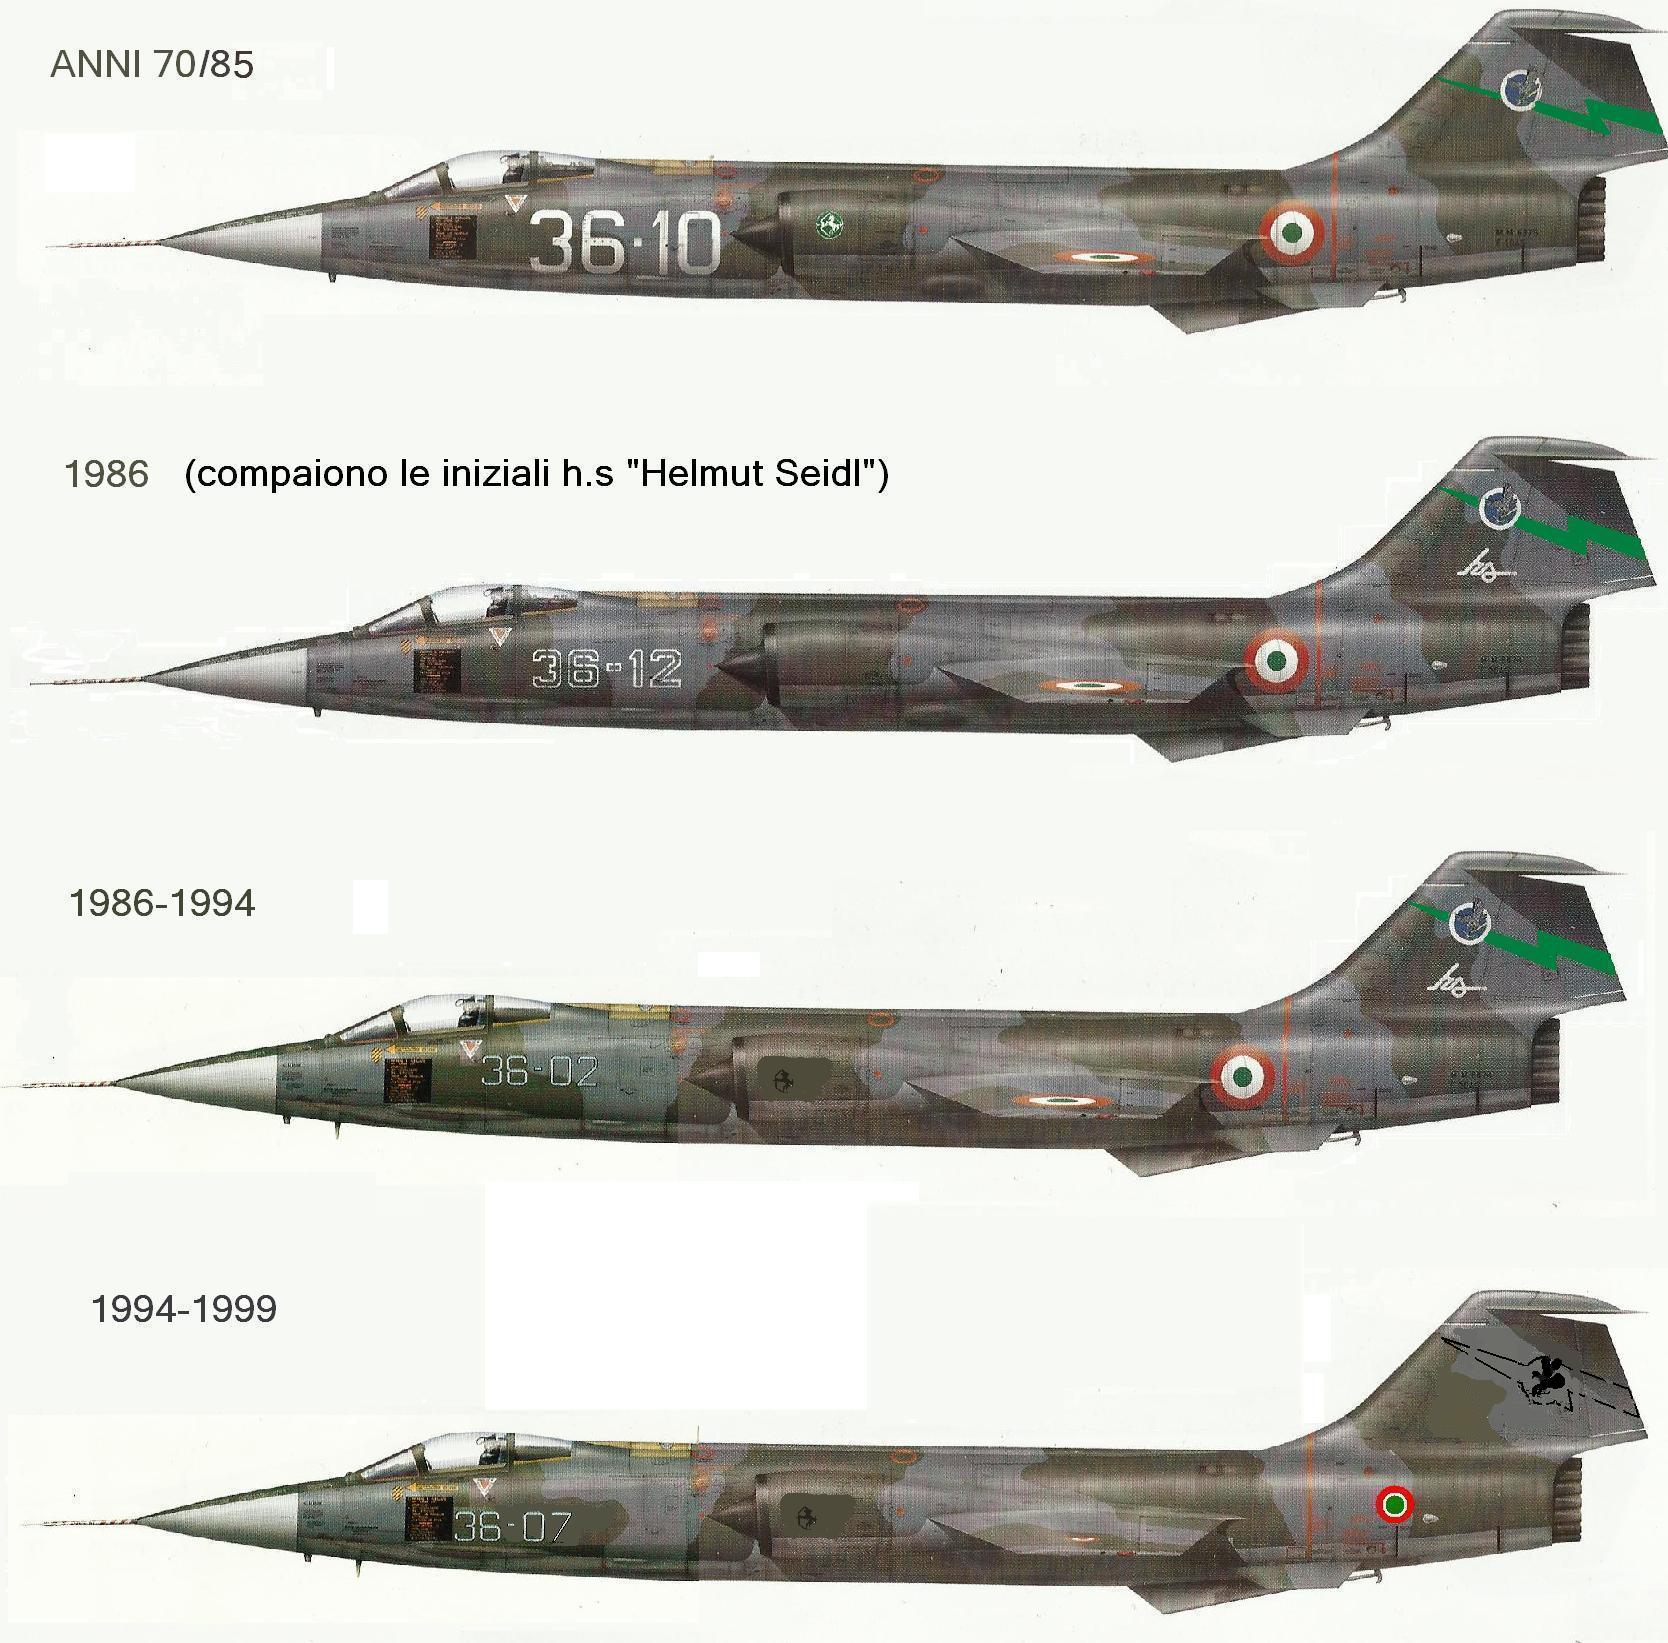 Lockheed F-104 Starfighter (11)